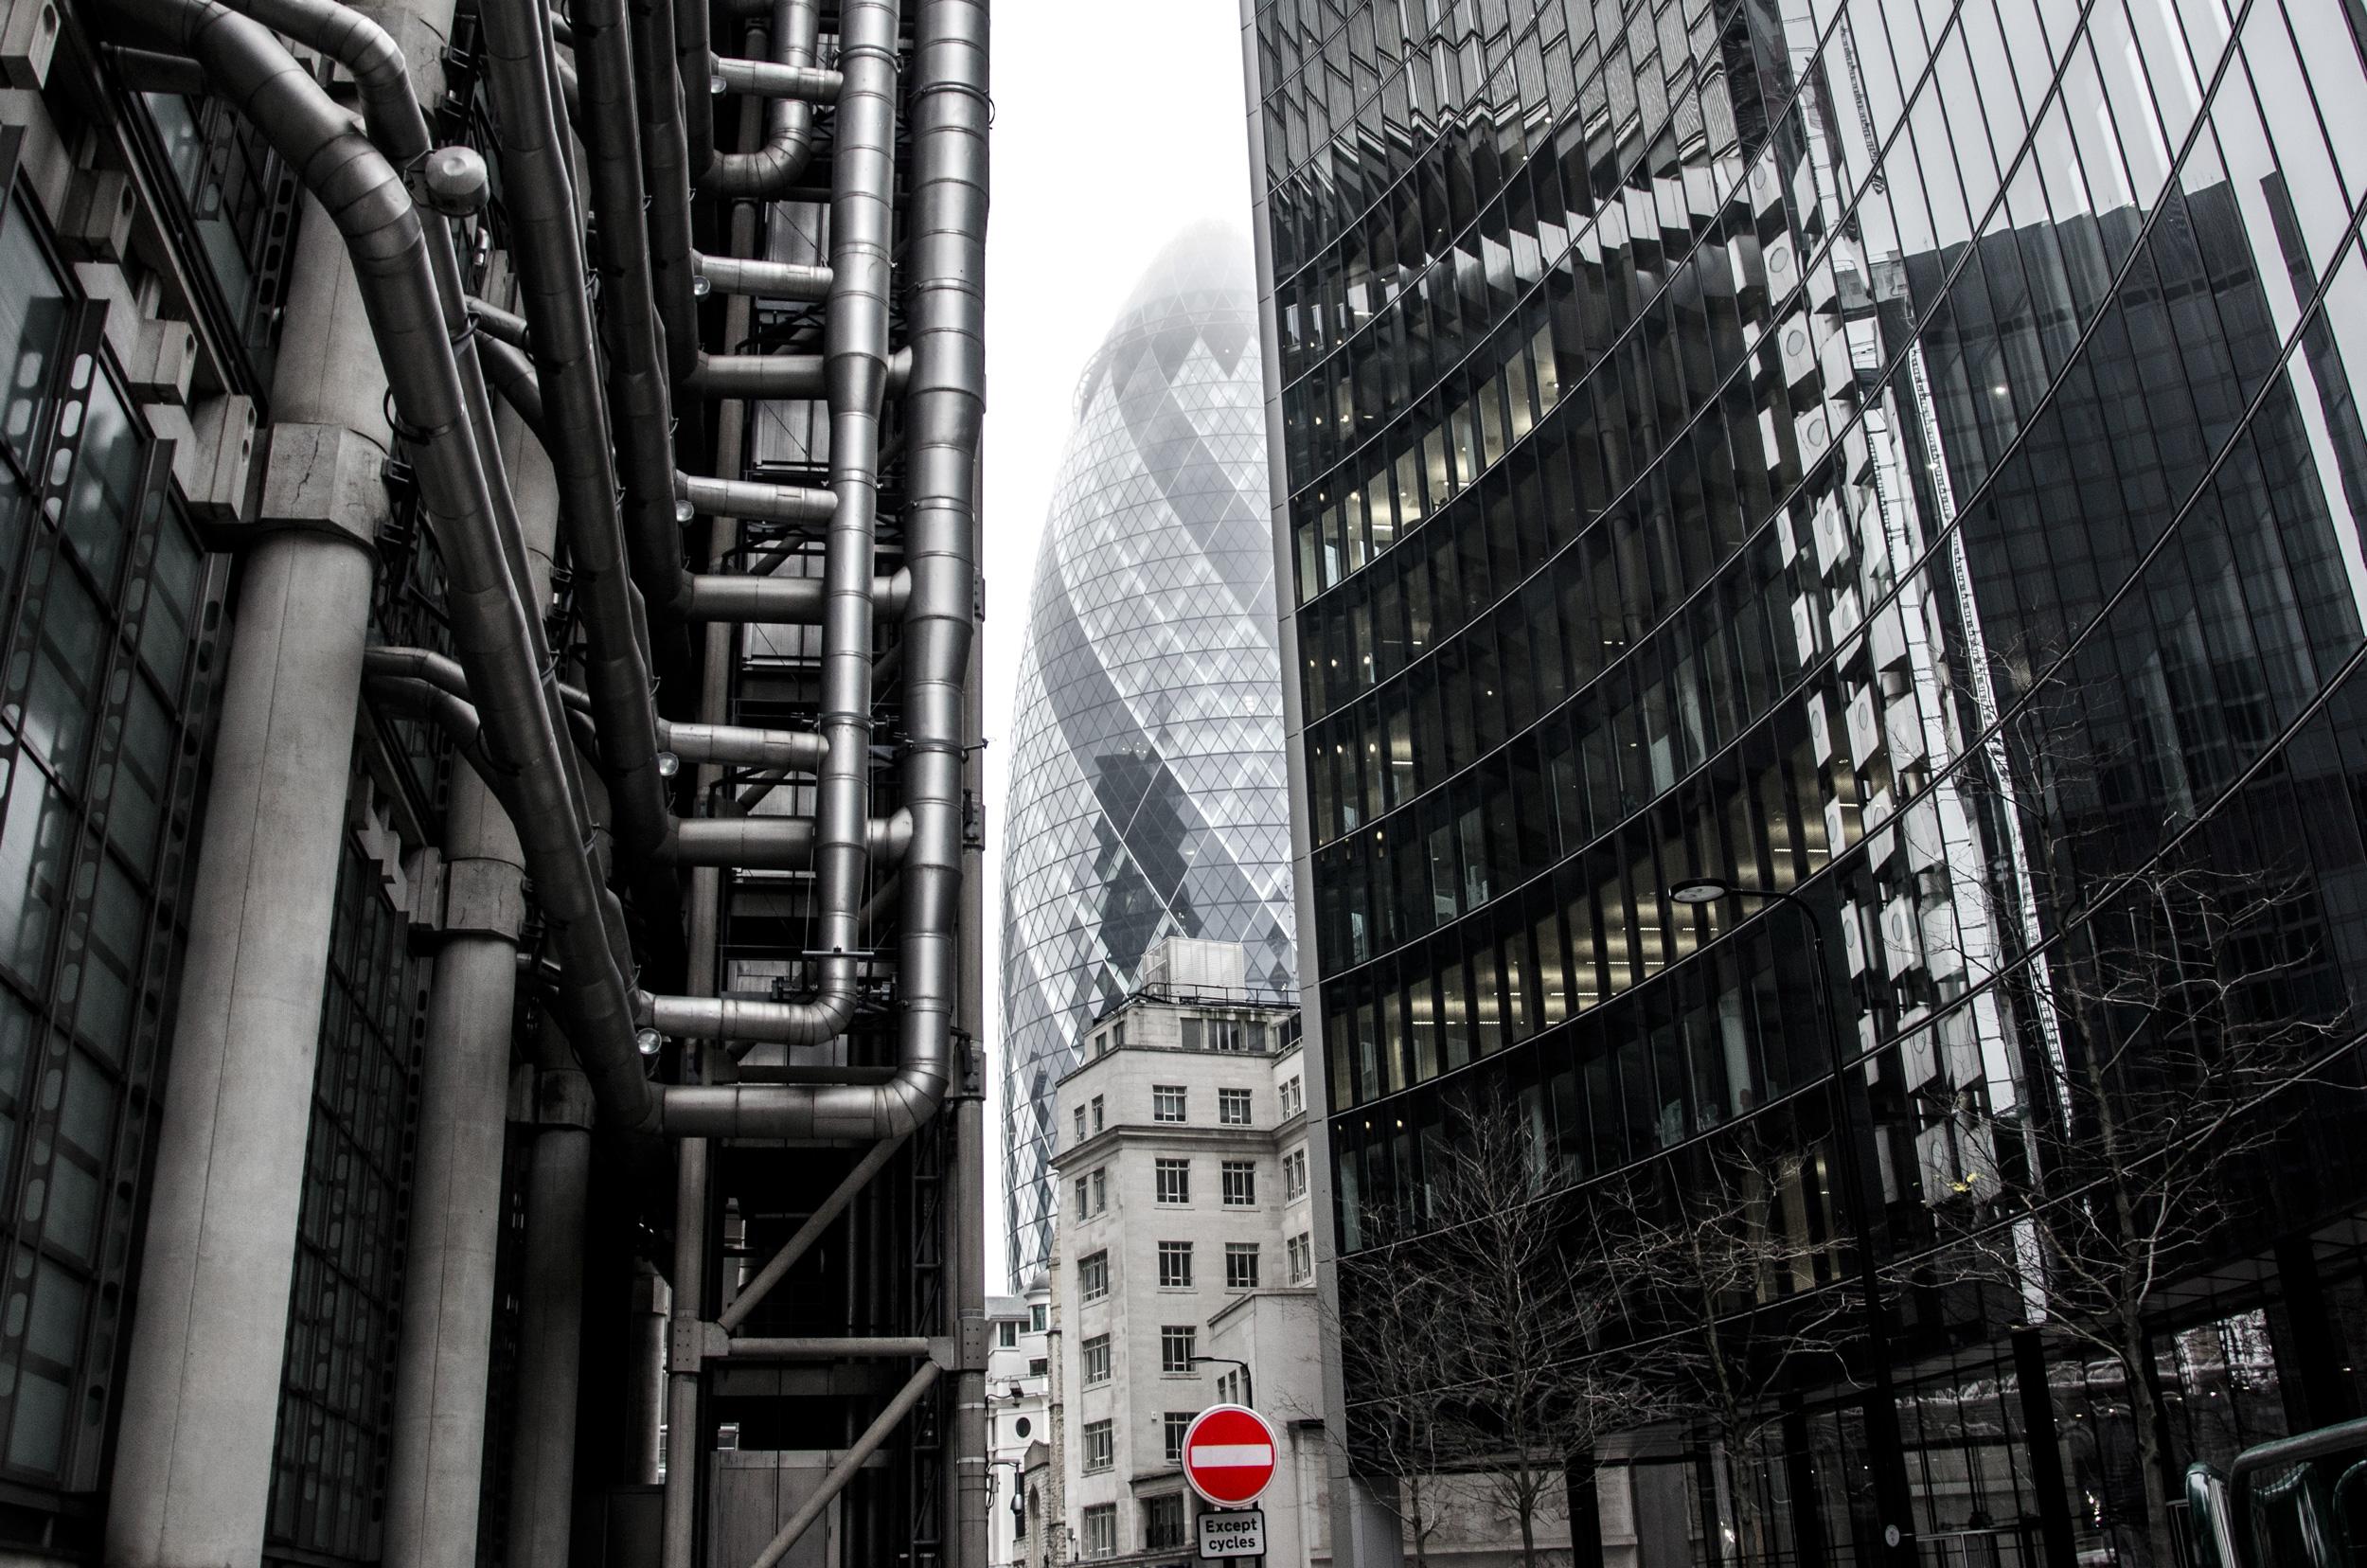 Wallpaper : London, window, city, street, cityscape, architecture ...